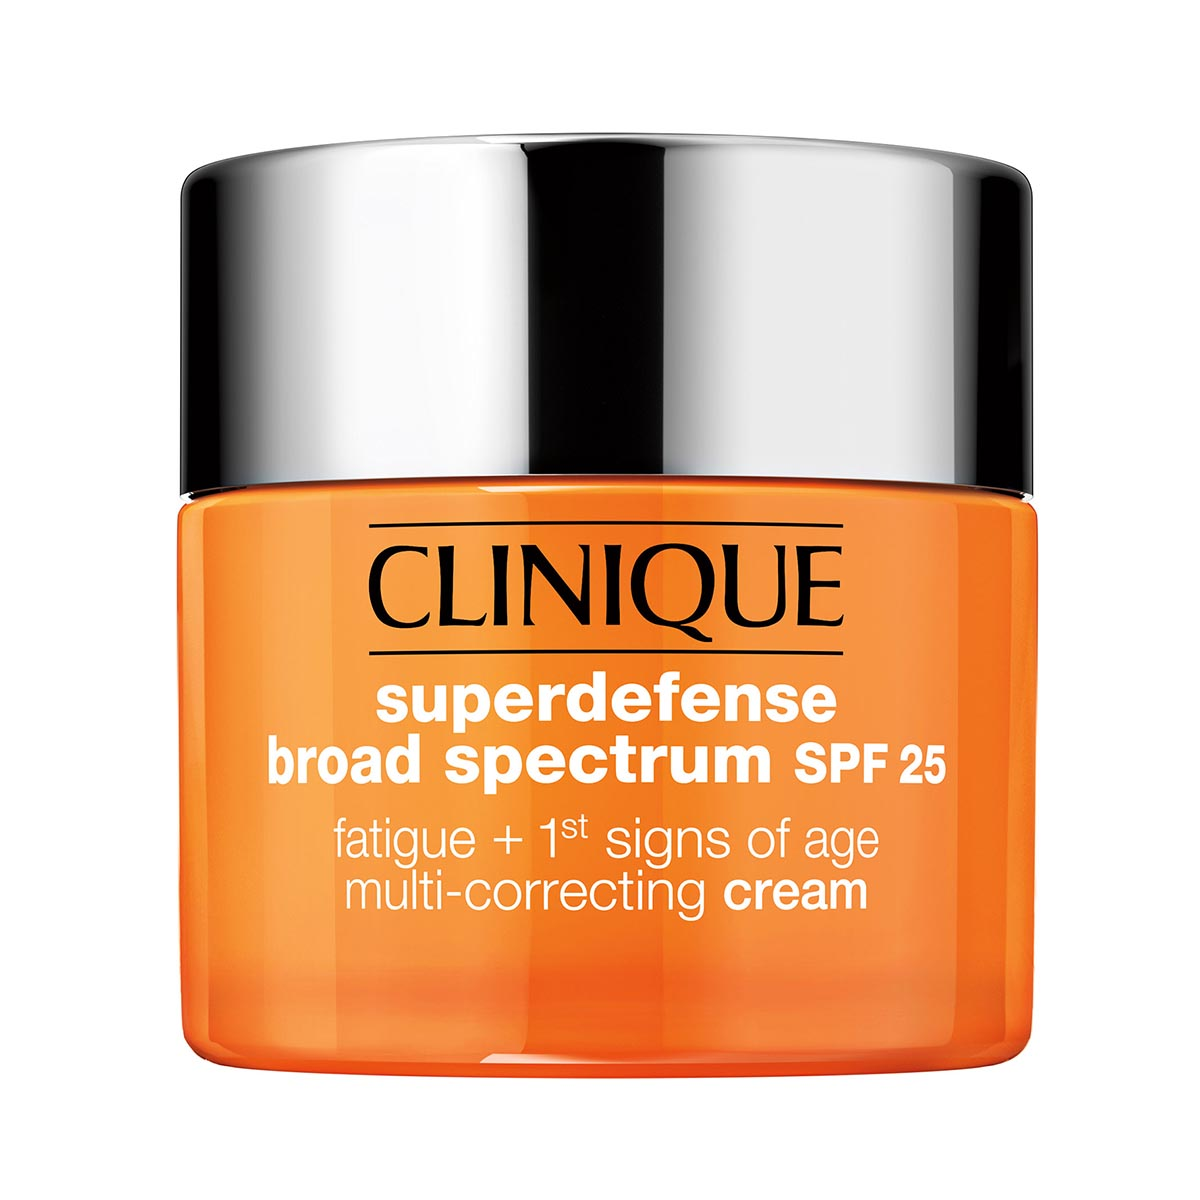 Clinique superdefense broad spectrum spf25 50ml - BellezaMagica.com